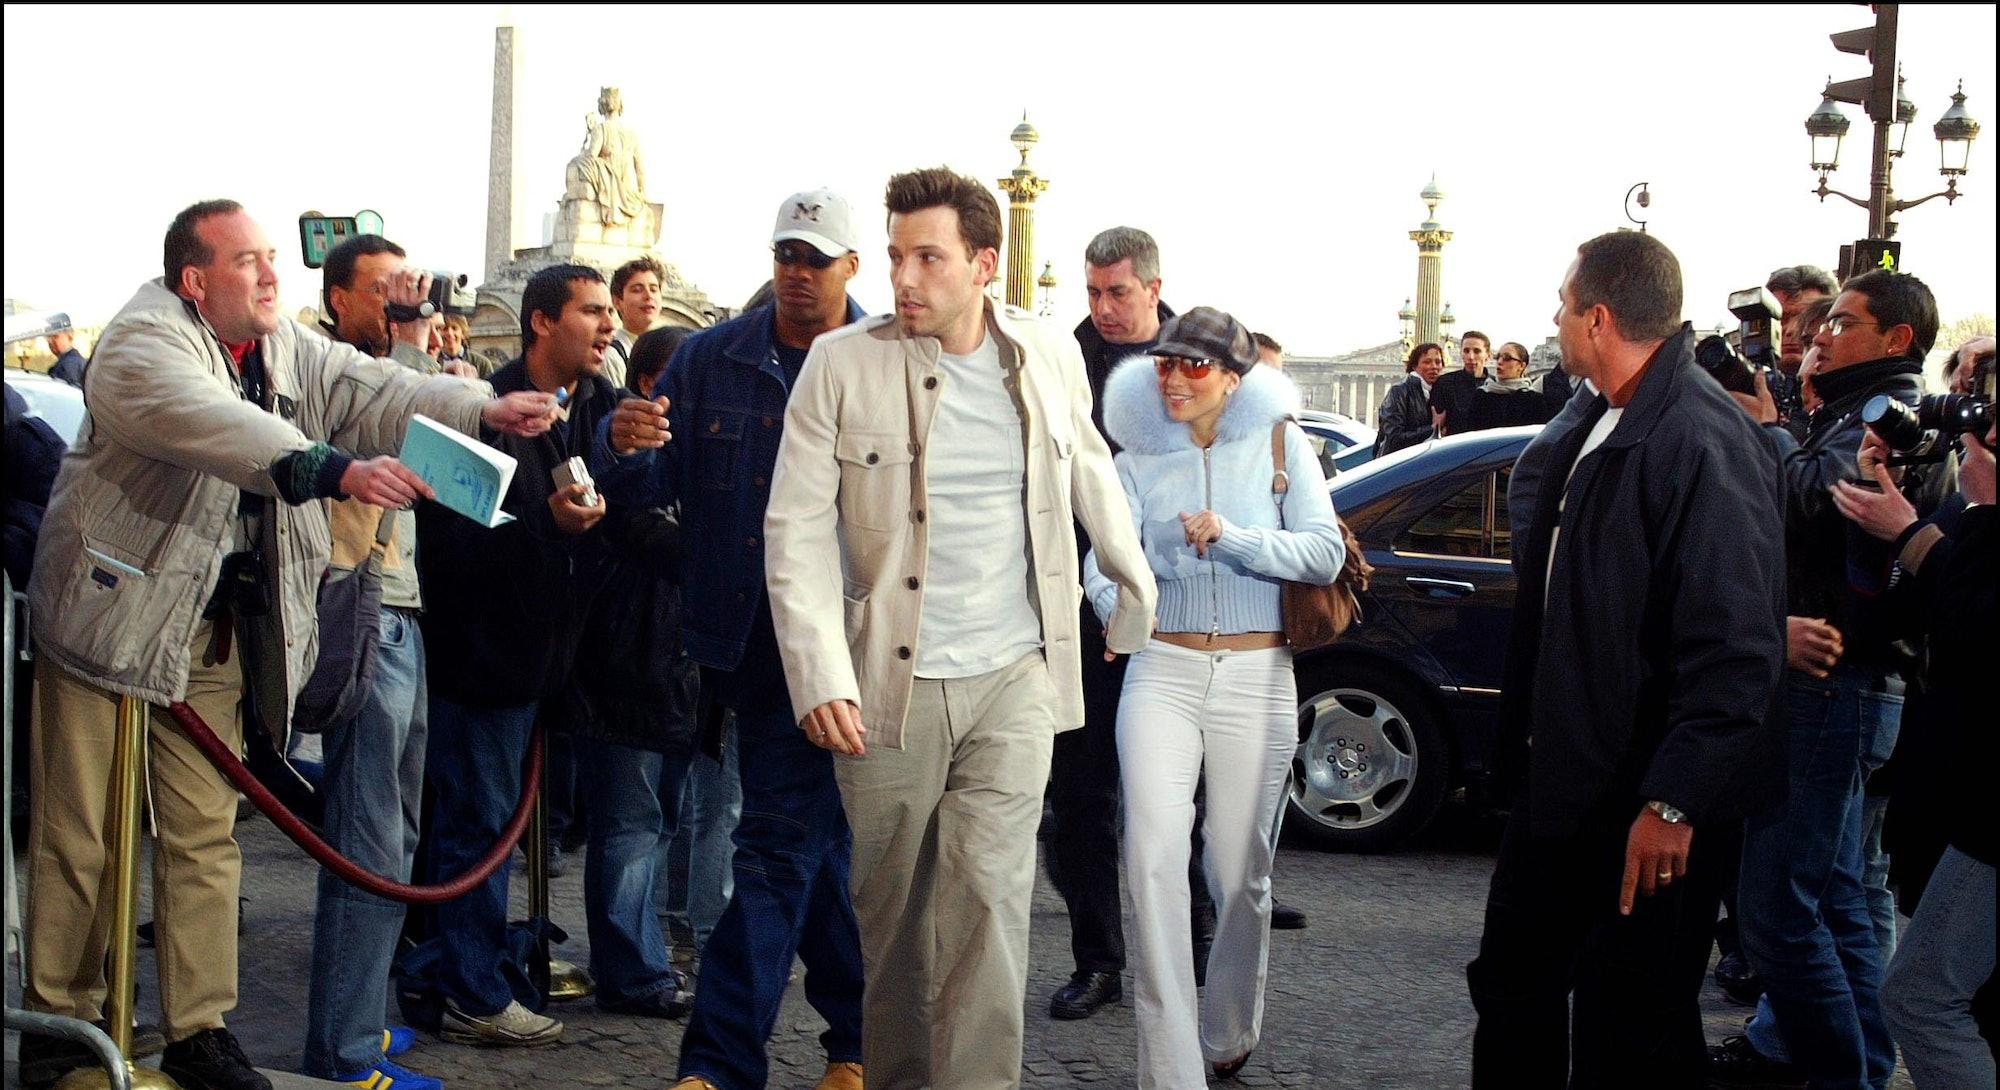 FRANCE - APRIL 09:  Jennifer Lopez and Ben Affleck in Paris, France on April 09, 2003.  (Photo by Po...